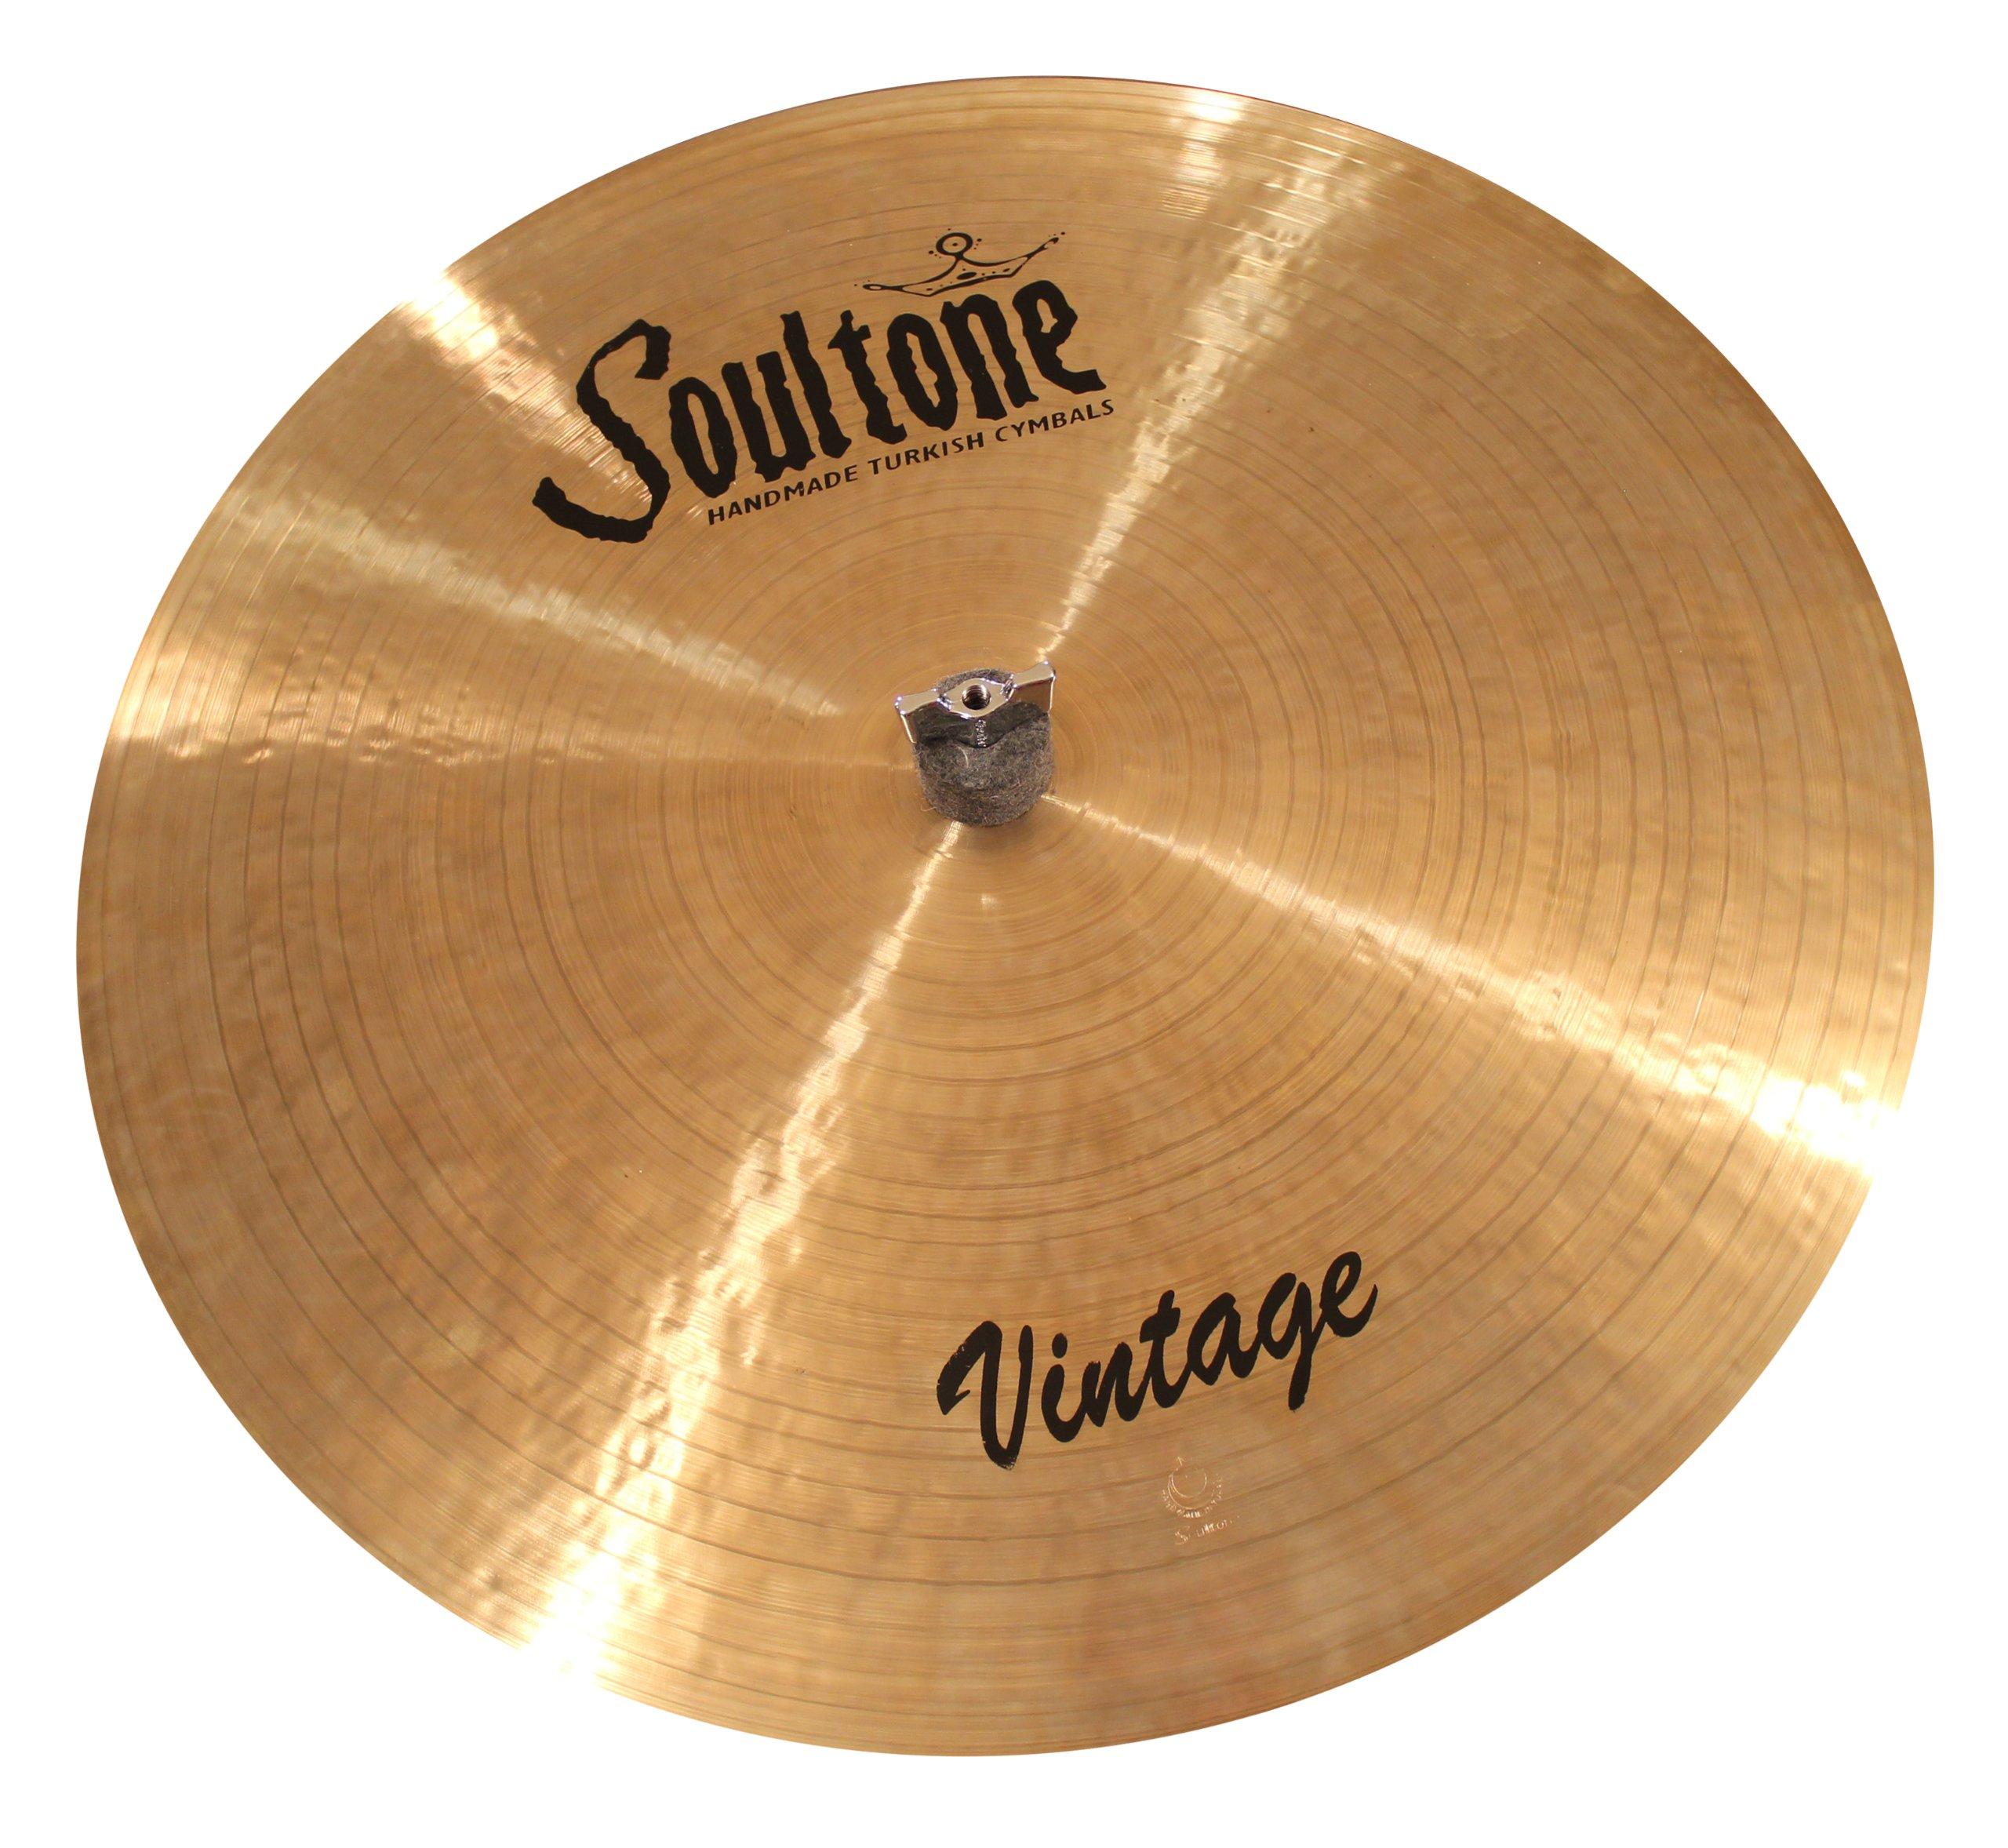 Soultone Cymbals VNT-FLHHTT15-15'' Vintage Flat Hi Hat Top Only by Soultone Cymbals